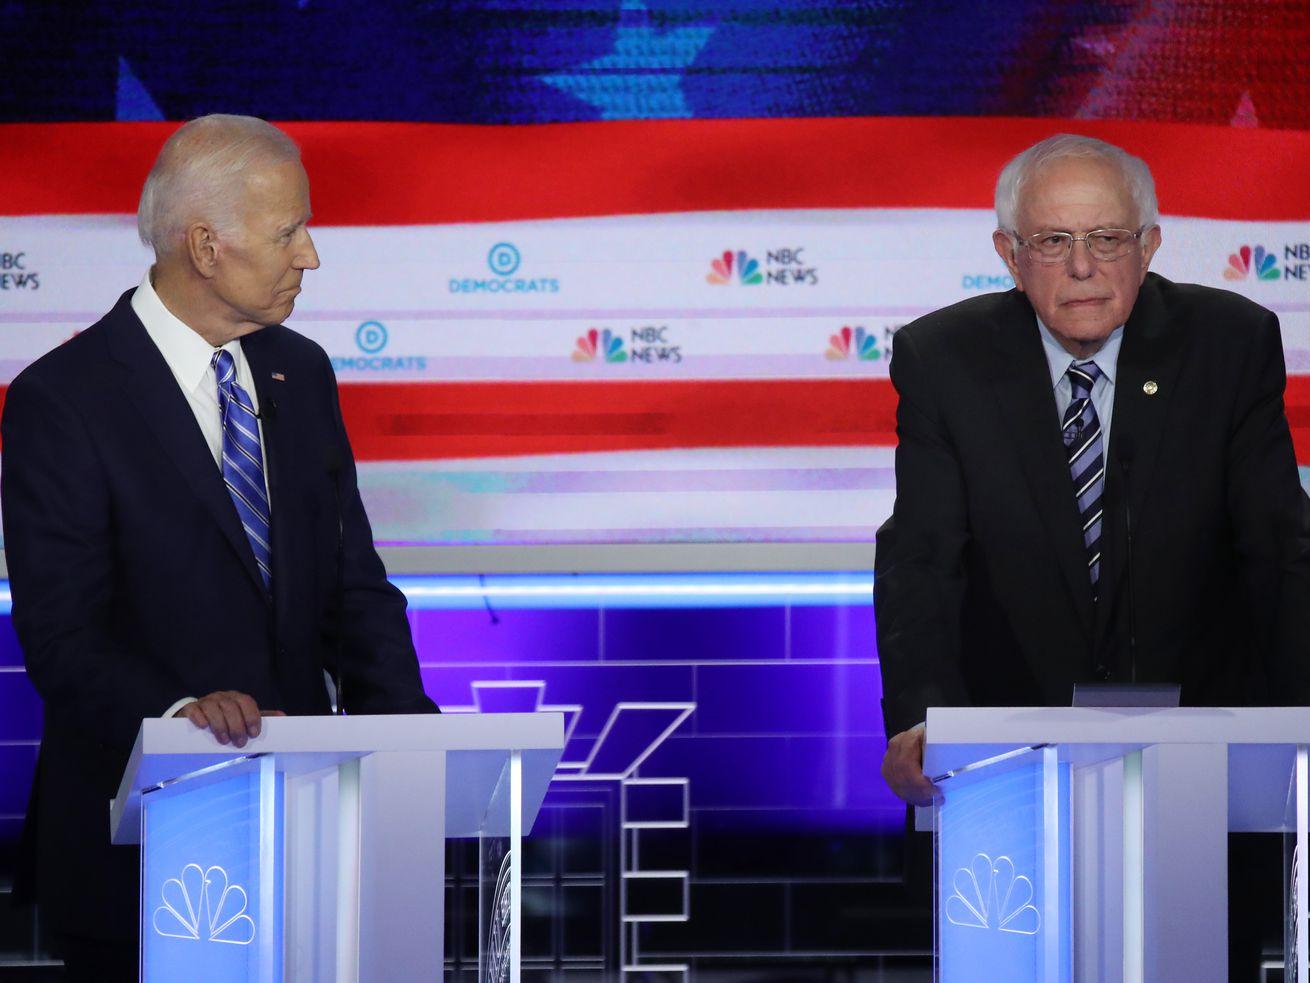 Former Vice President Joe Biden and Senator Bernie Sanders stand behind podiums onstage at the first Democratic debate of 2019.